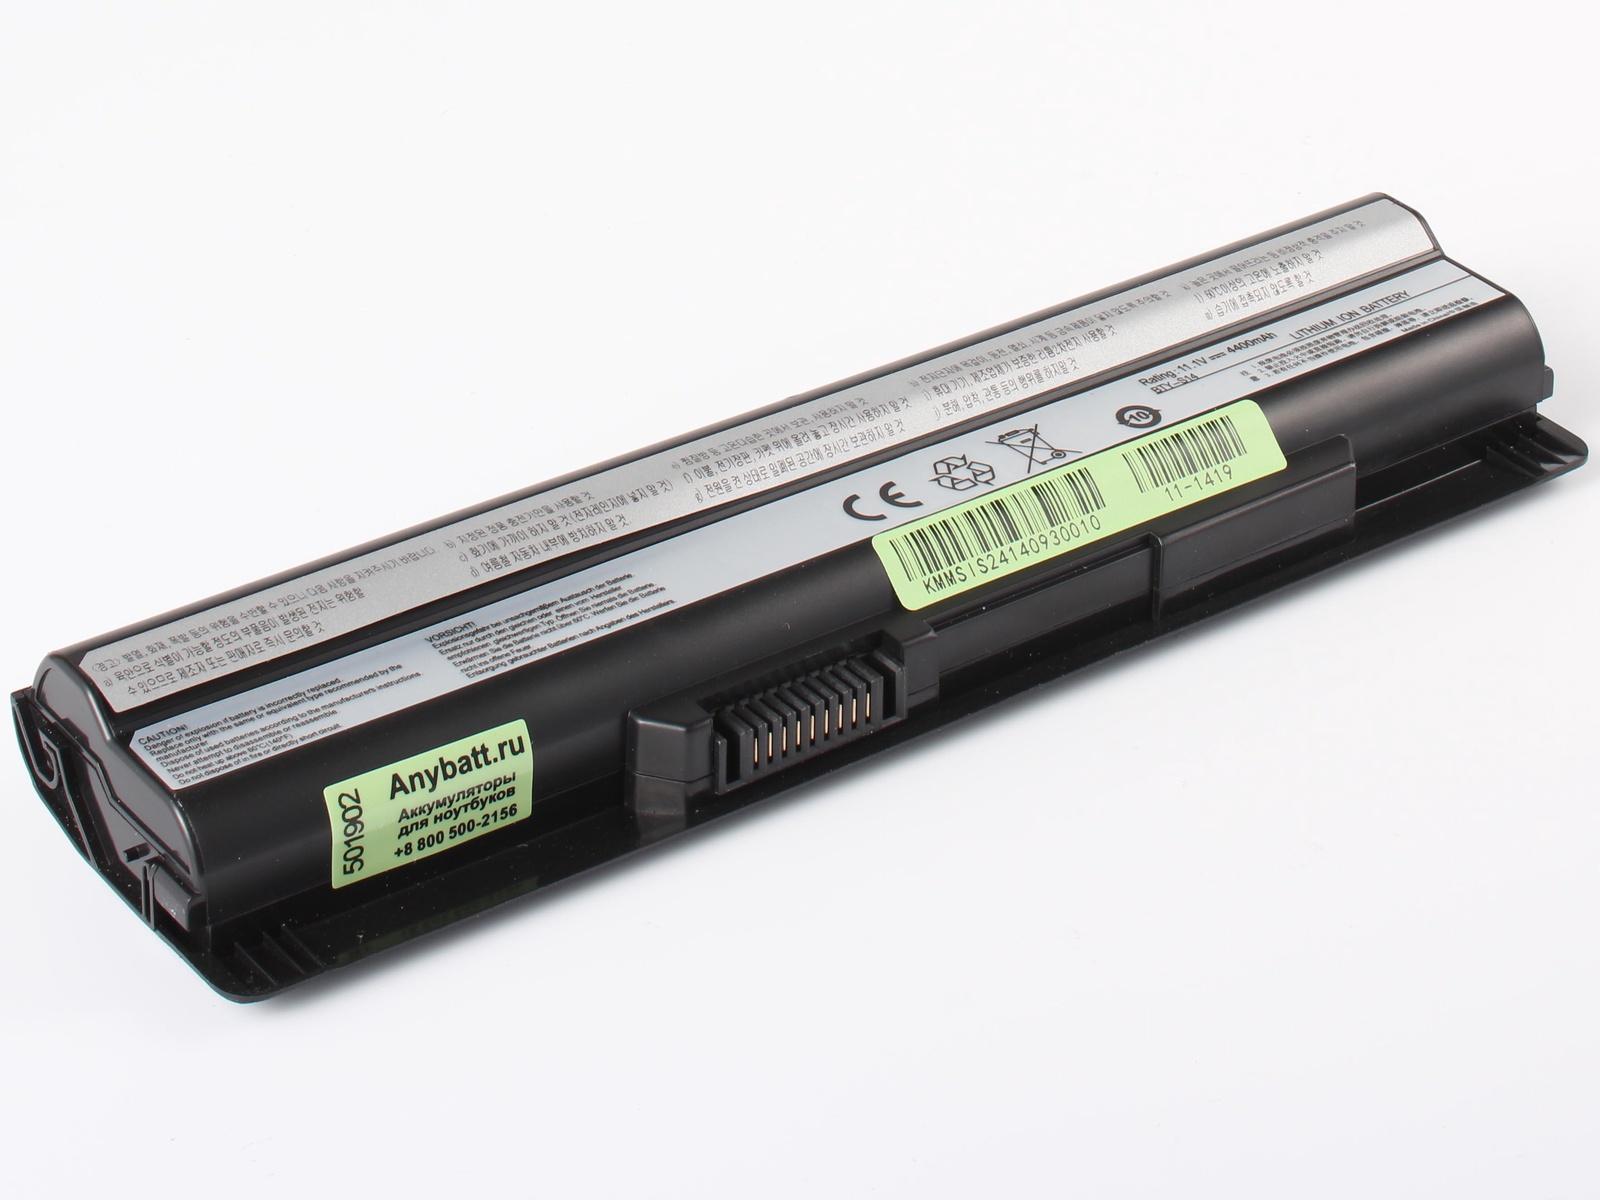 Аккумулятор для ноутбука AnyBatt для MSI GE60 0NC, FR600, CX70 0NF, GE70 2OE, GE60 0ND, FX610, FX603, CX70 2QF, CX61 2PC, GE70 0NC, CR61 3M, FR700, CR61 2M, CX70 2OD-037XRU, GP60 2OD, GE60 2PG, CX70 0NF-202, CX61 0ND, CX61 0OD аккумулятор для ноутбука anybatt для msi ms 16g4 ge60 2pf fx620dx gp70 2od ge70 2od cr70 2m cx61 0nc fx610mx ge60 2qe cx70 0nd gp70 2qe fr400 fr610 ge70 2qd cx70 0nf 210 gp70 2qe leopard cx61 2oc ge60 0nd 478